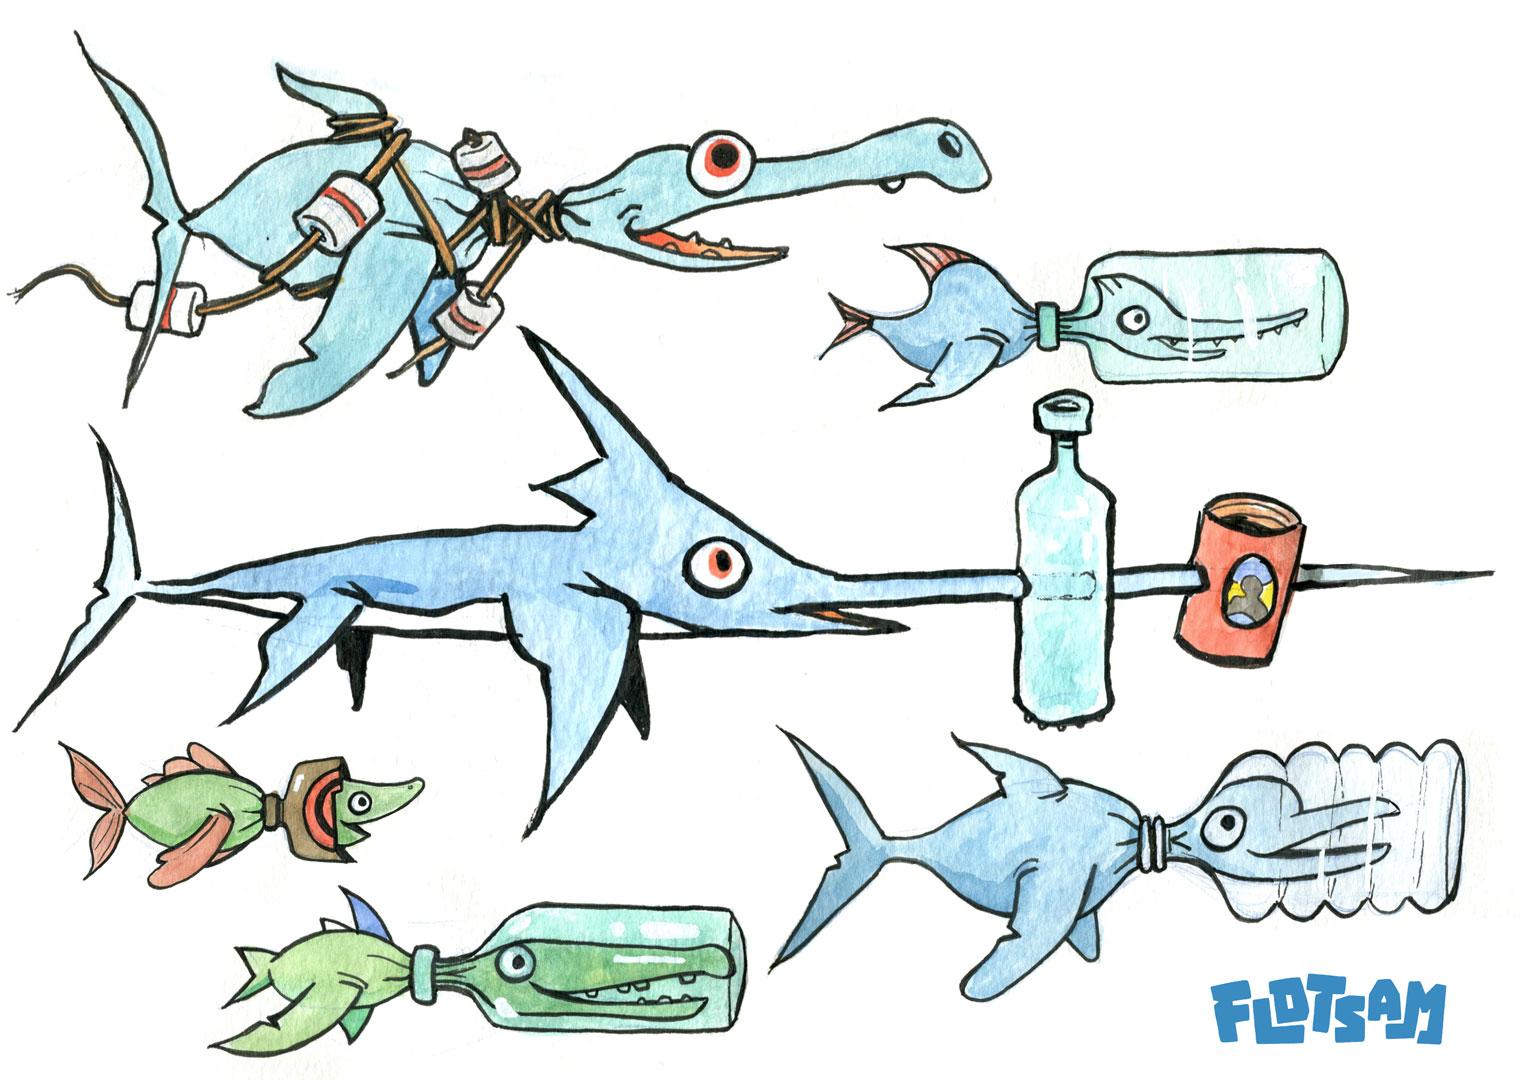 Flotsam game friendly fish concept